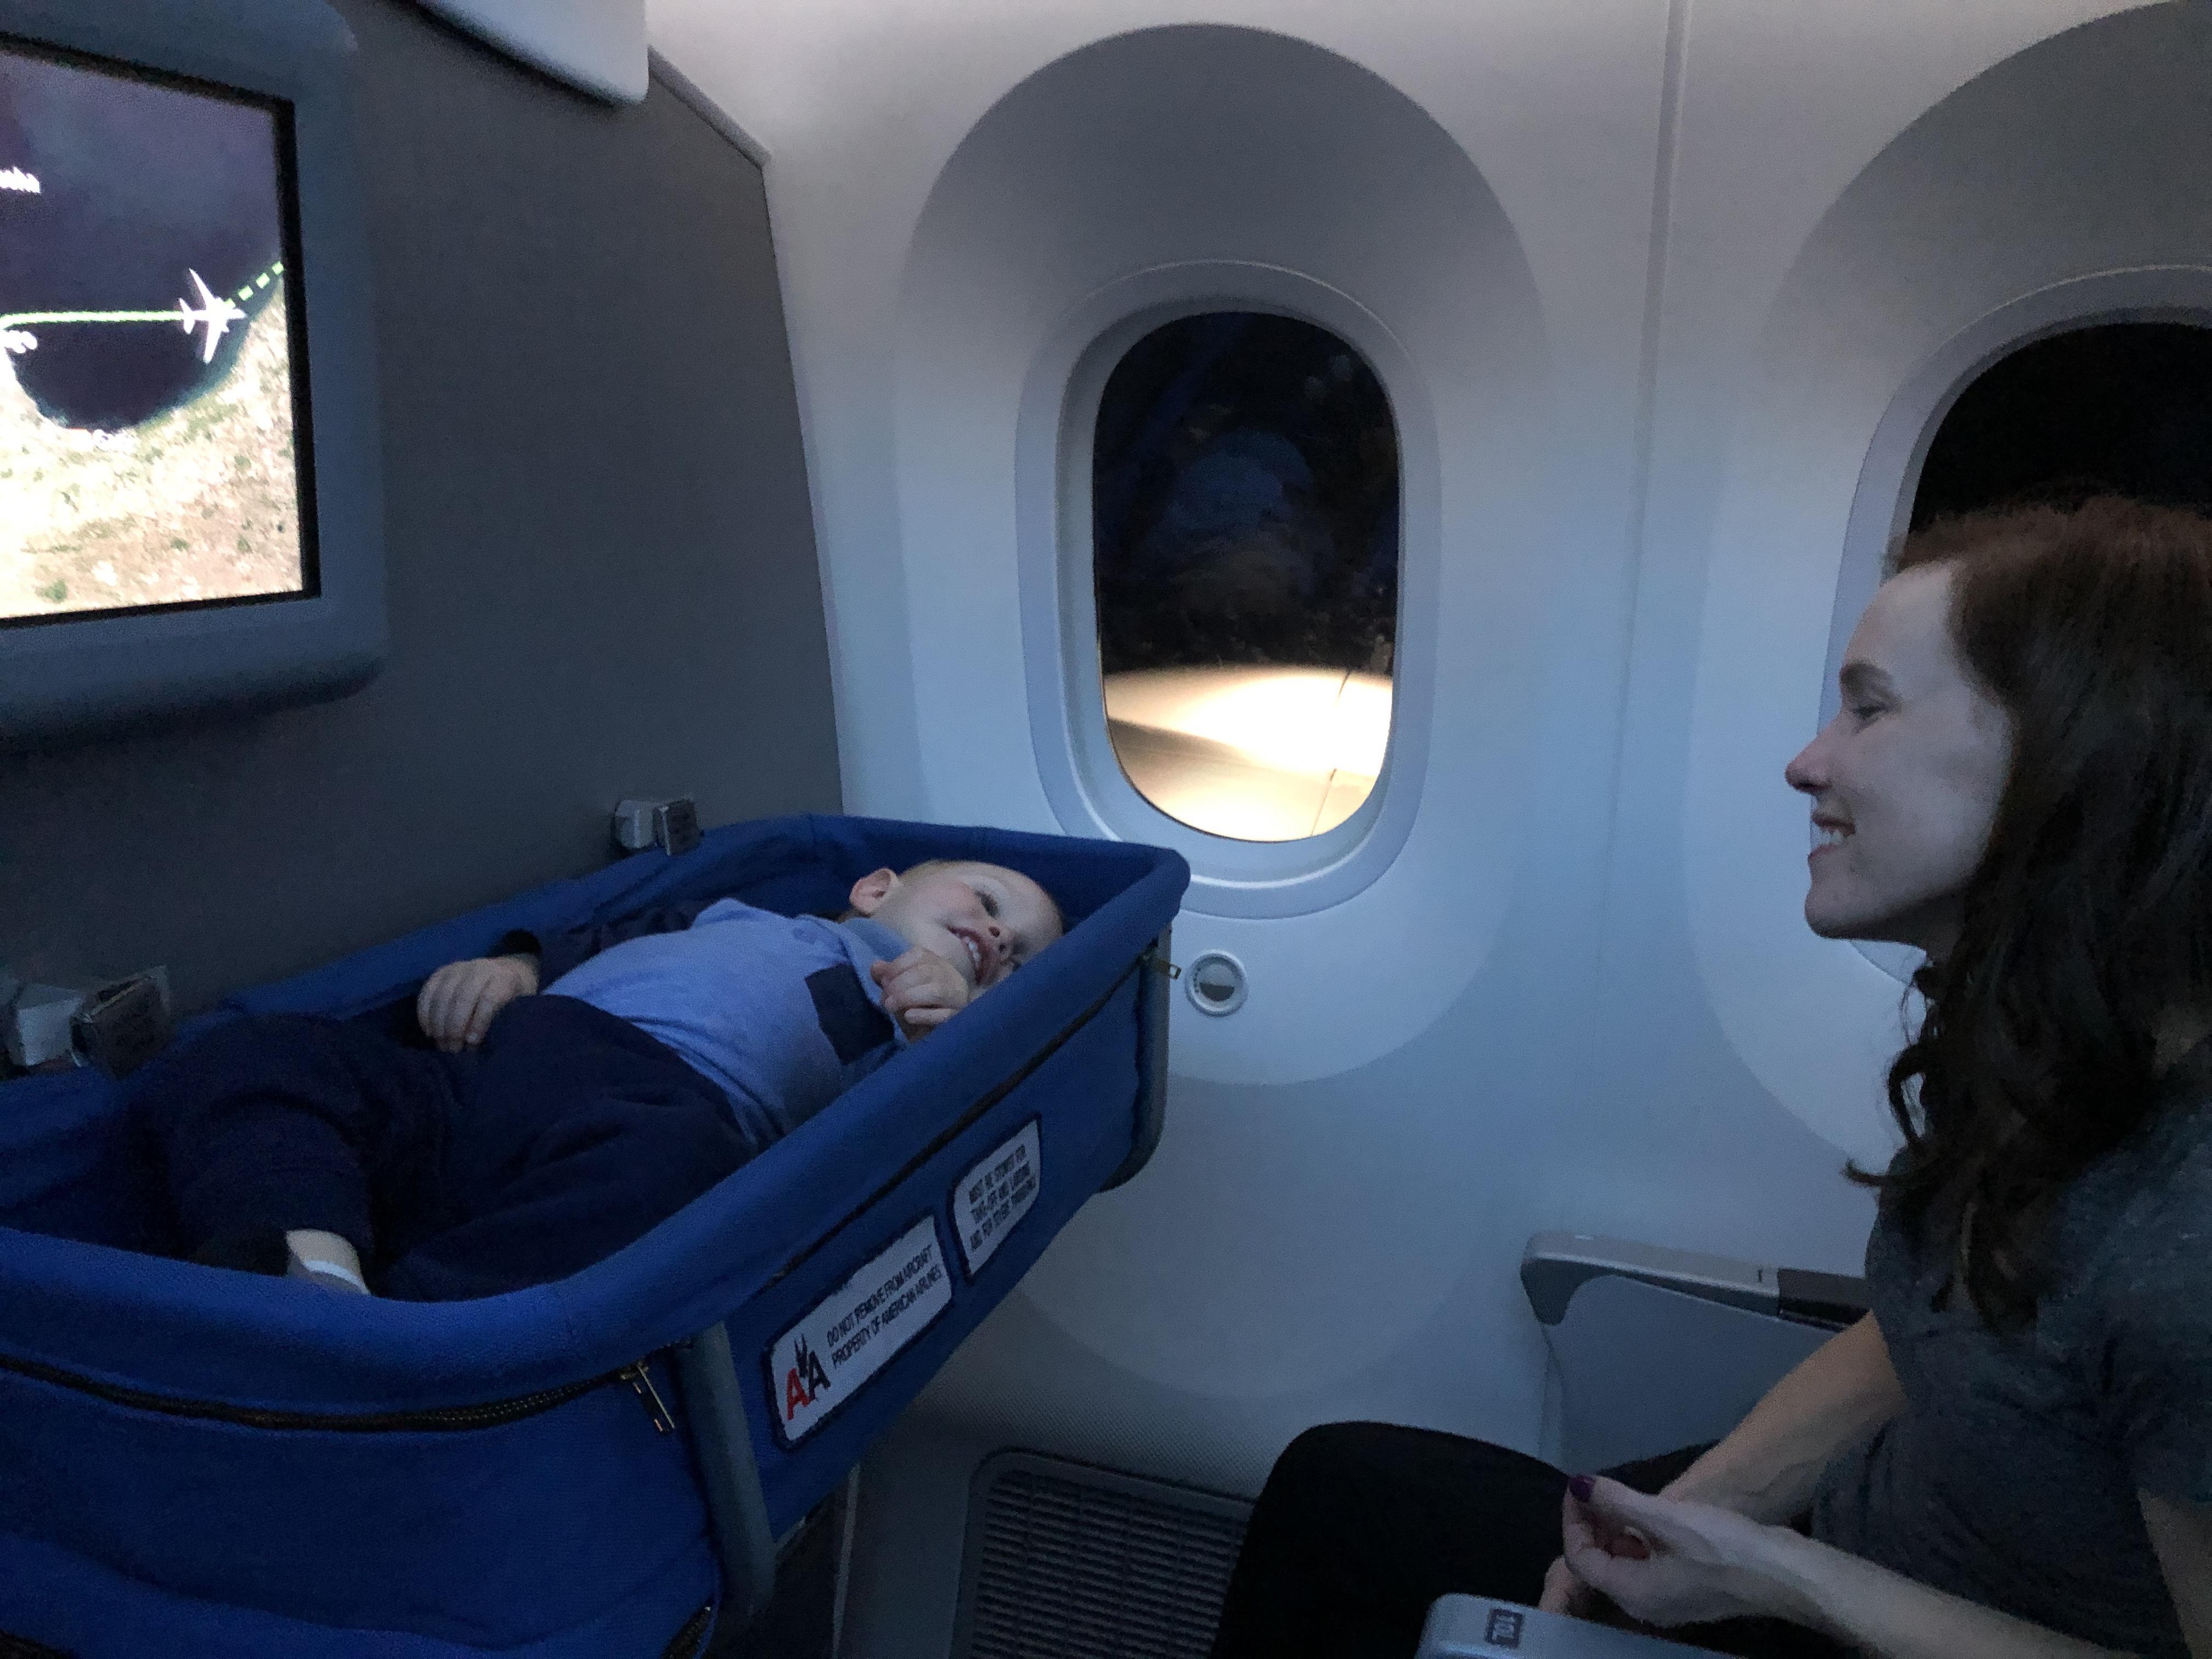 travel hack - bulk head bassinet - air travel with families